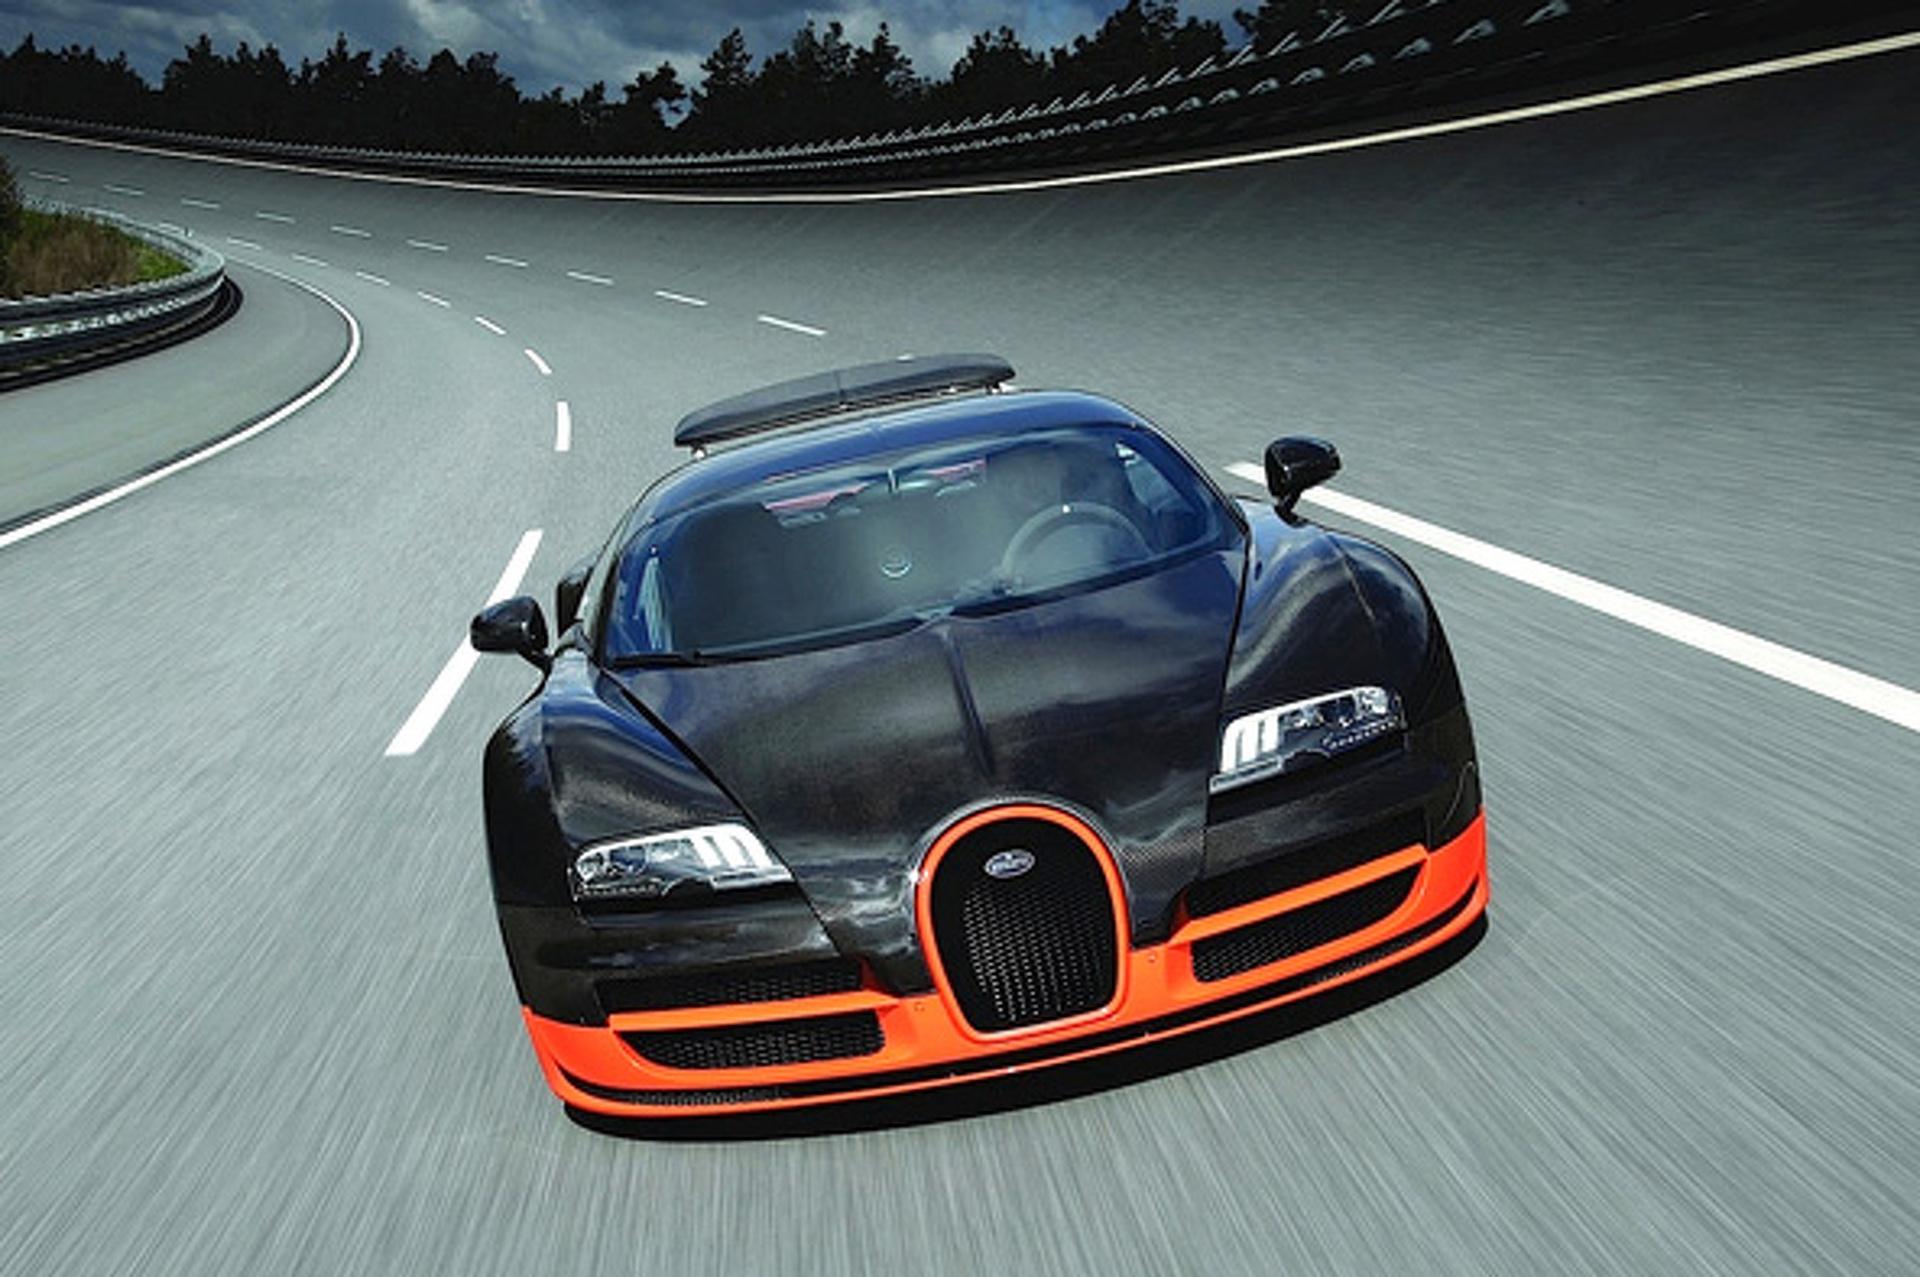 Wheels Wallpaper: Bugatti Veyron 16.4 Super Sport